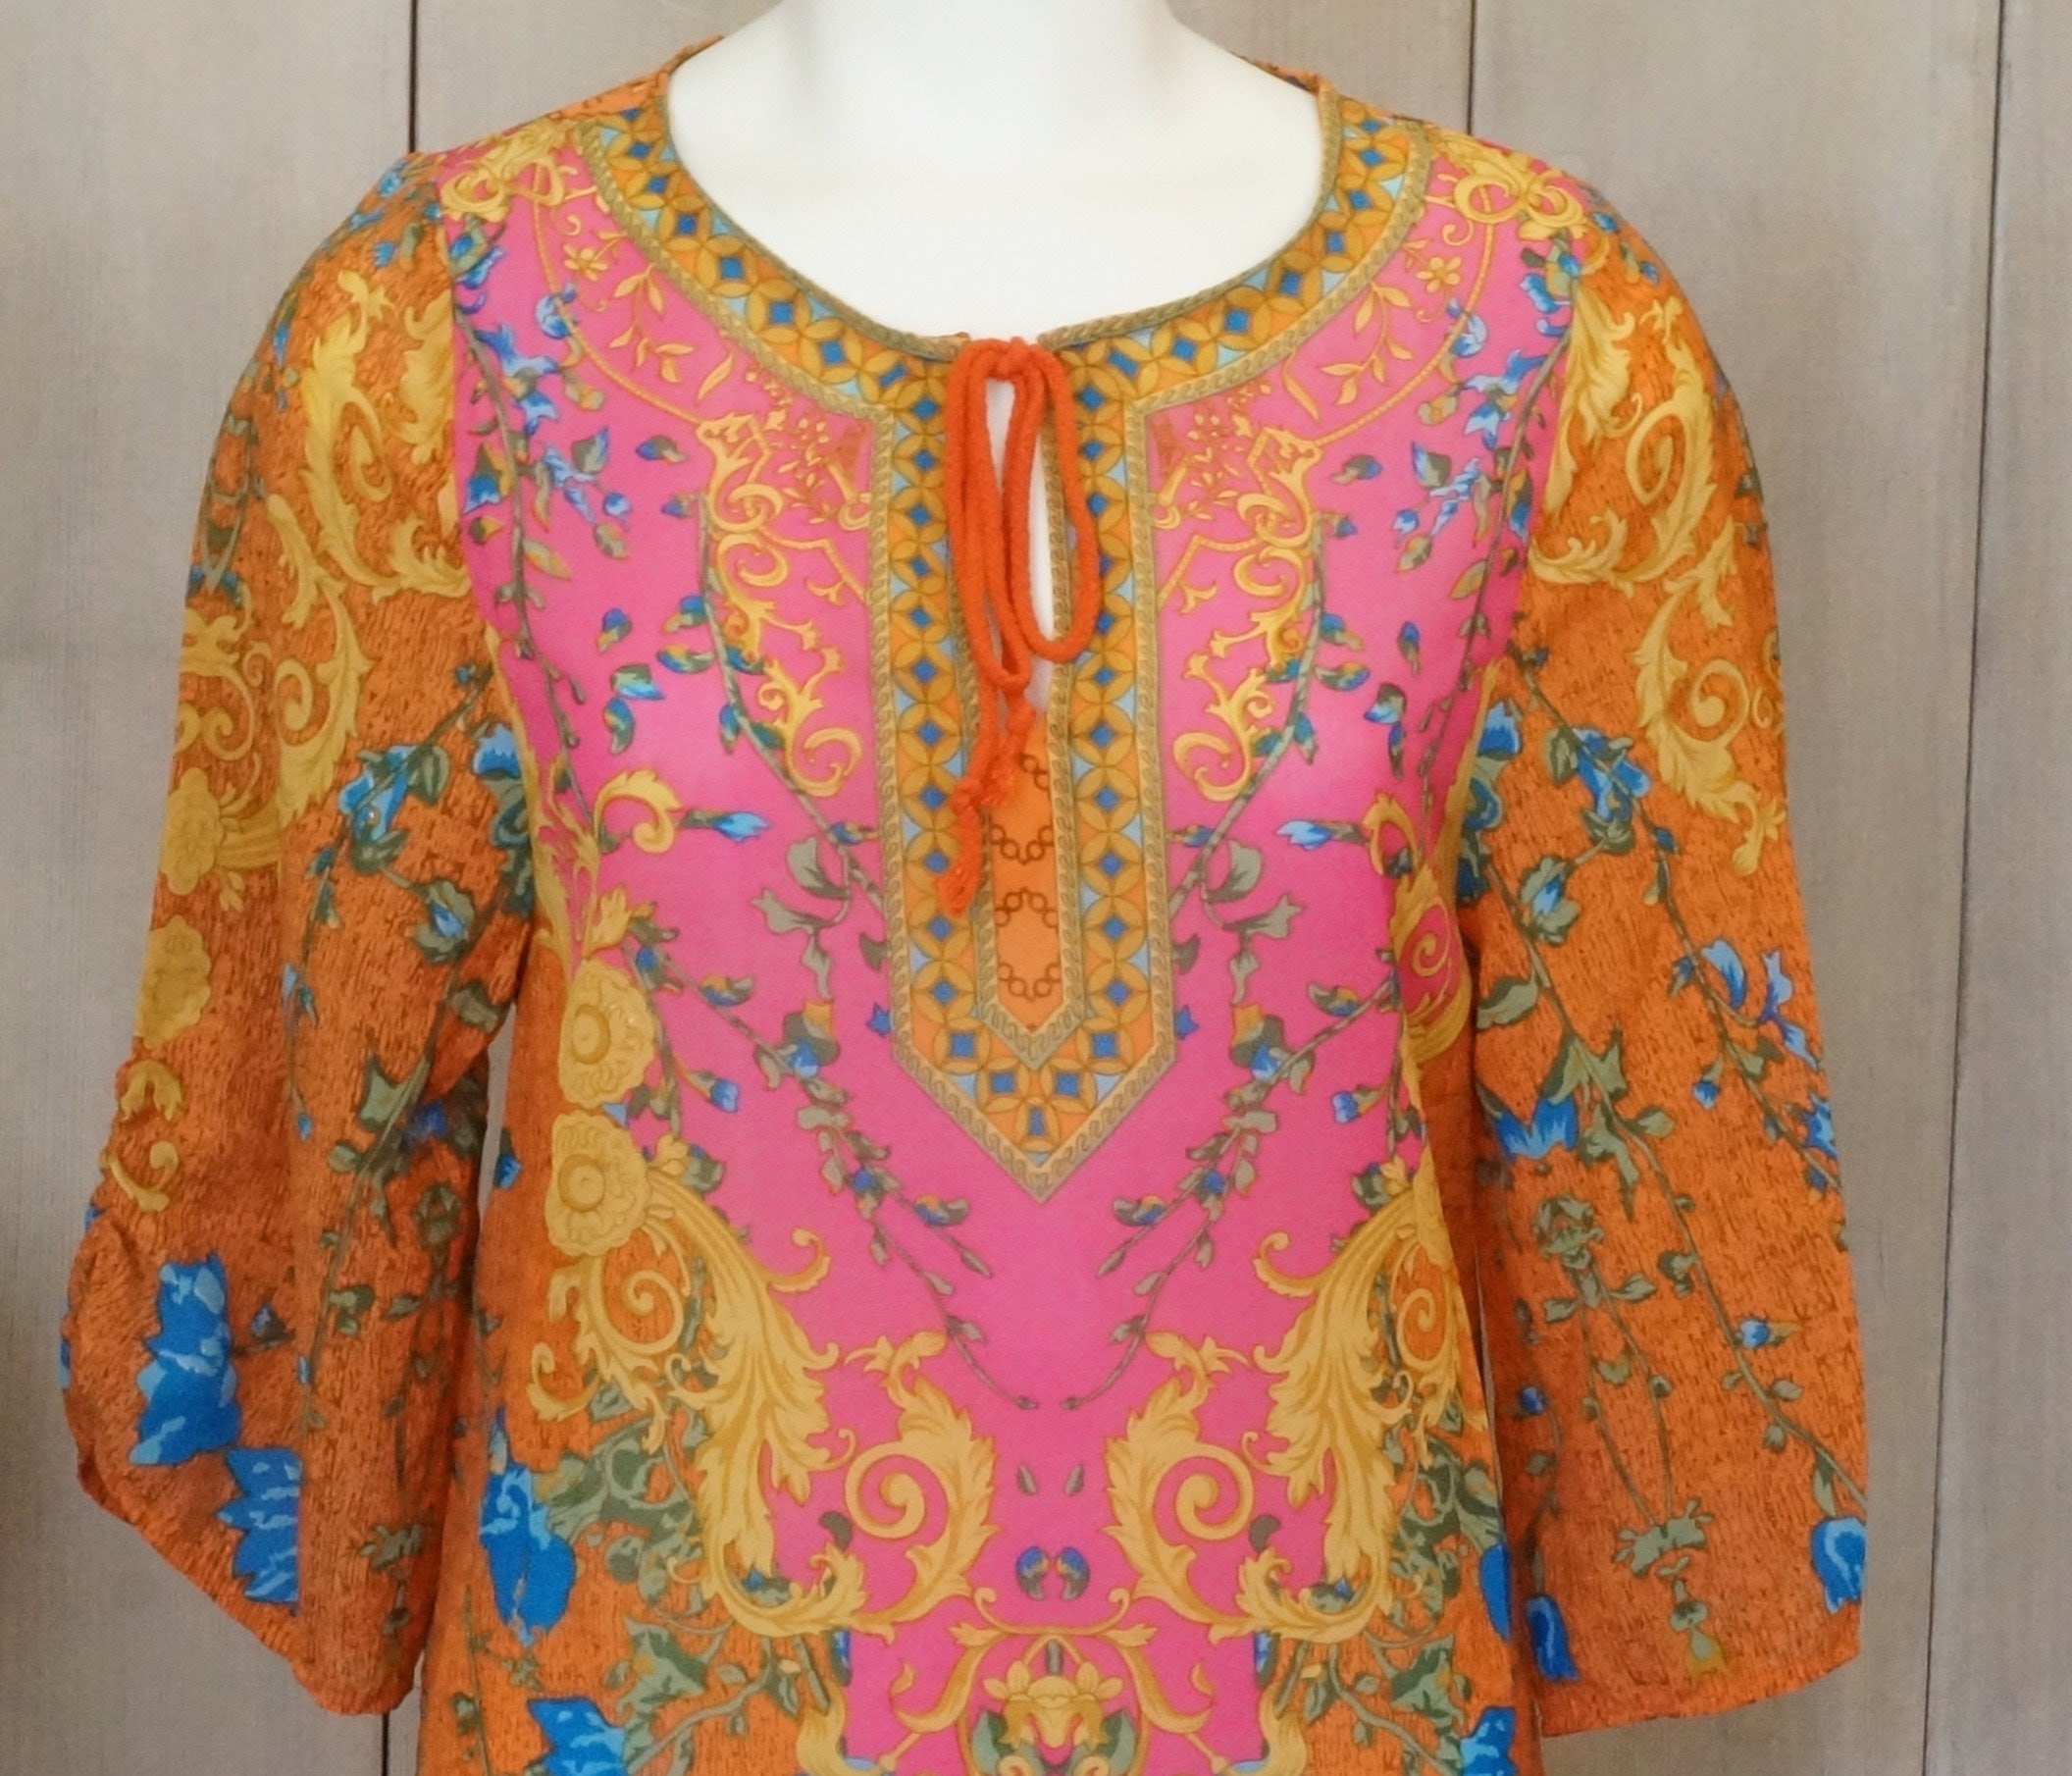 e3771ecd5bc25 Free Shipping! Vtg. Boho Hippie Long Camisole or Dress in Orange ...